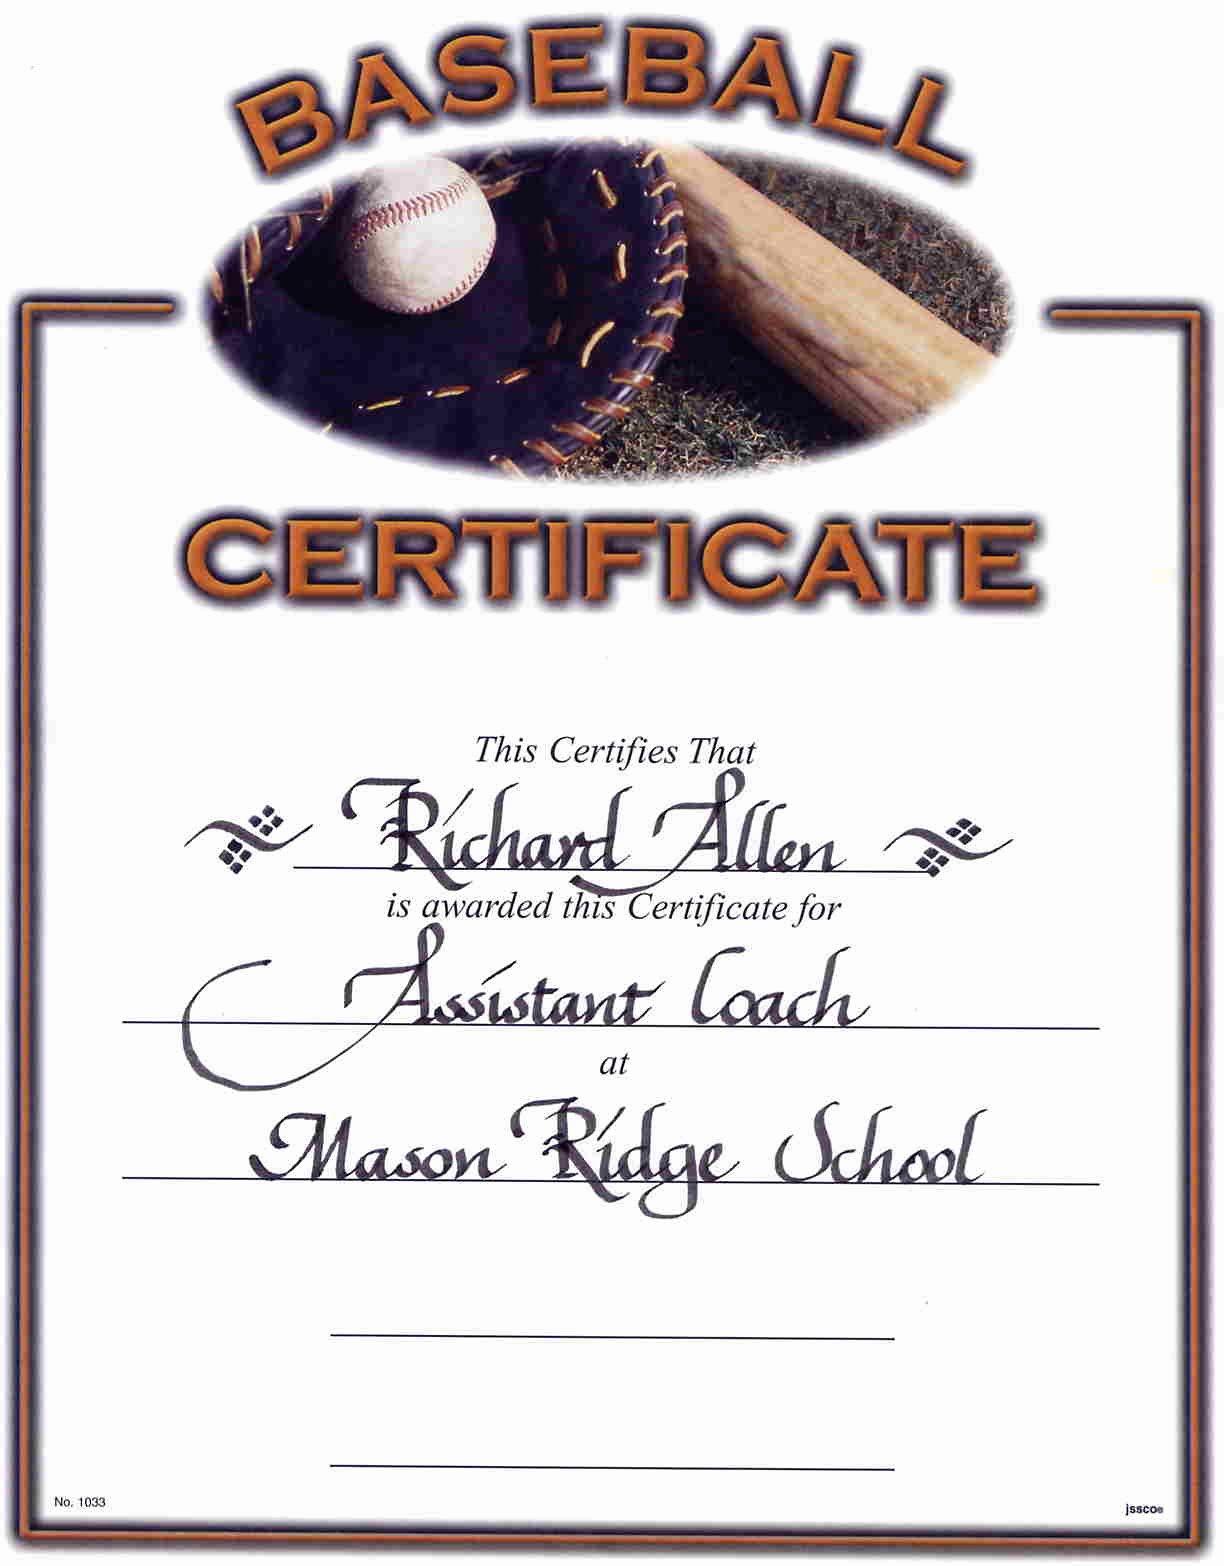 Baseball Certificates Templates Free Unique Best S Of Certificates for Youth Baseball Players